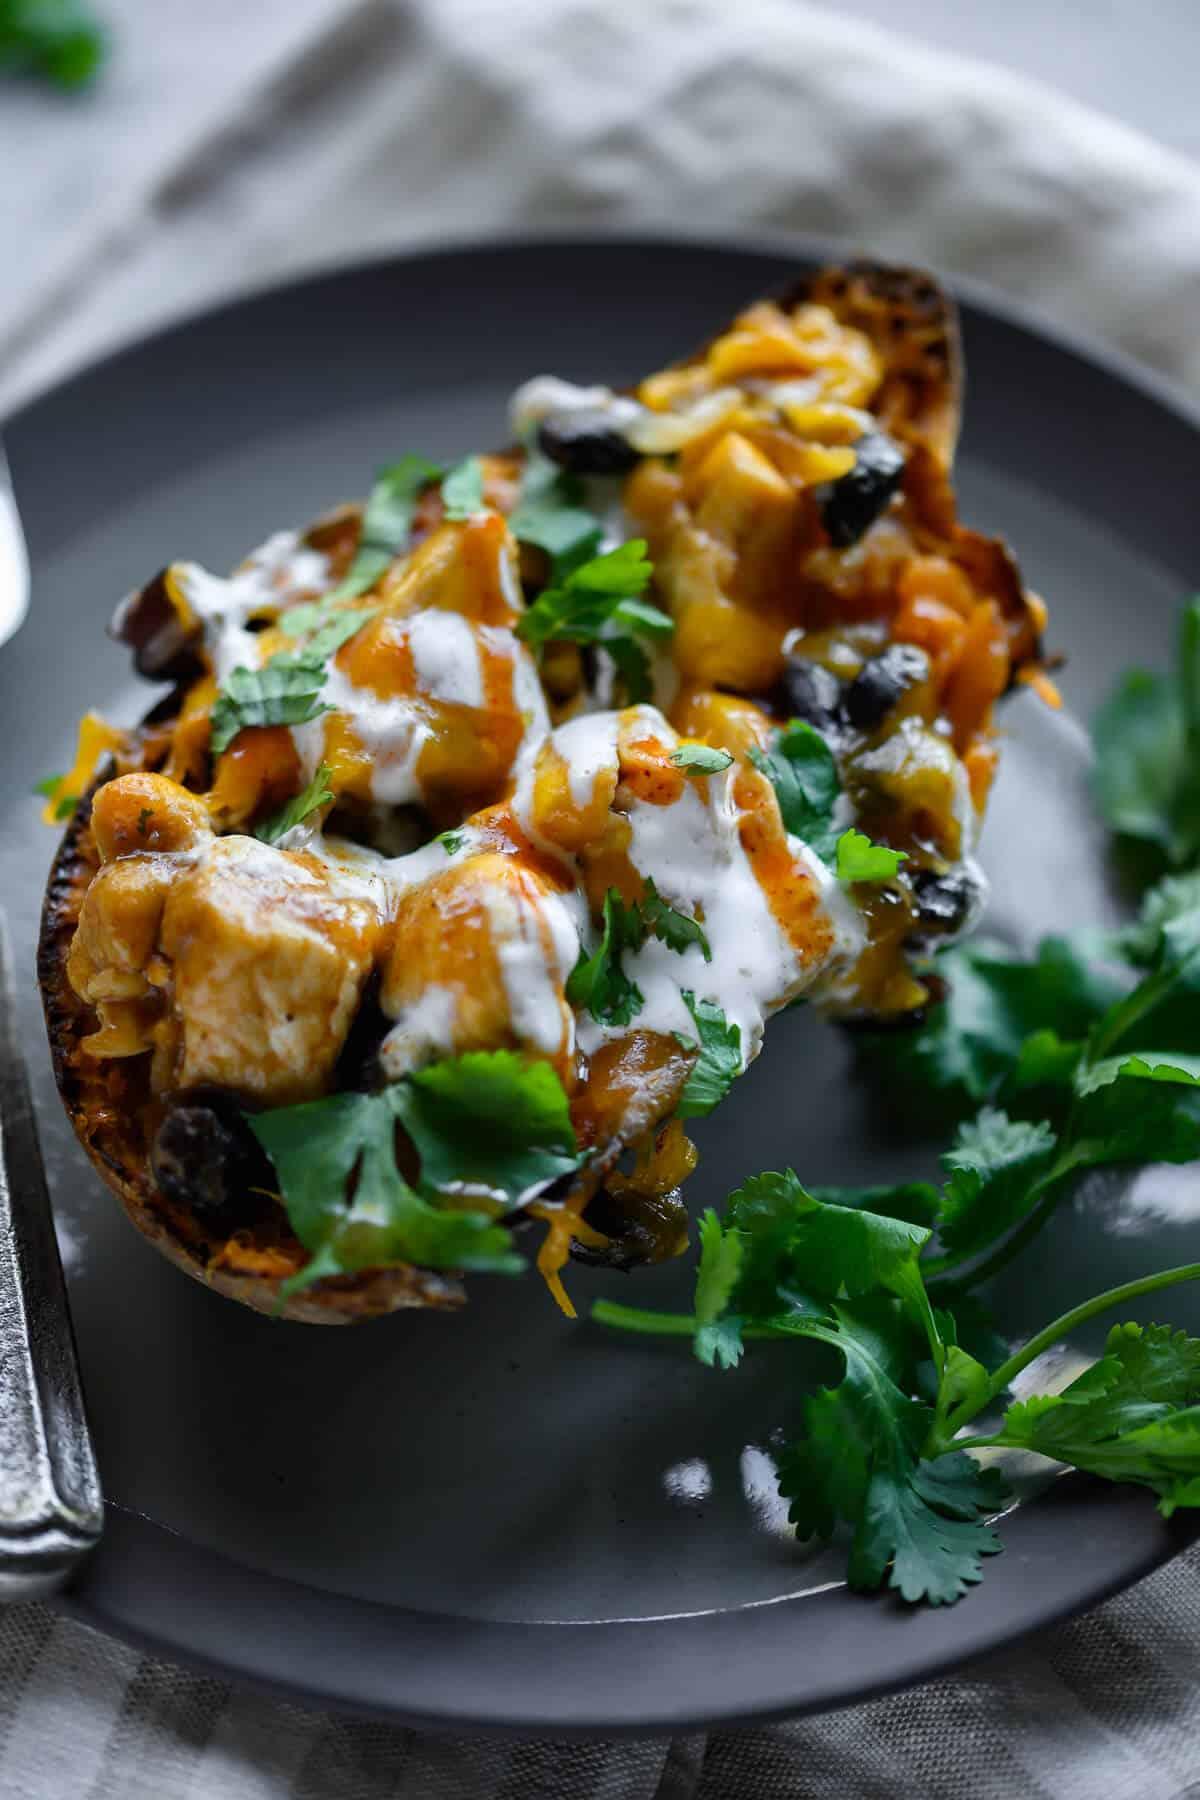 enchilada stuffed sweet potato on a plate garnished with cilantro